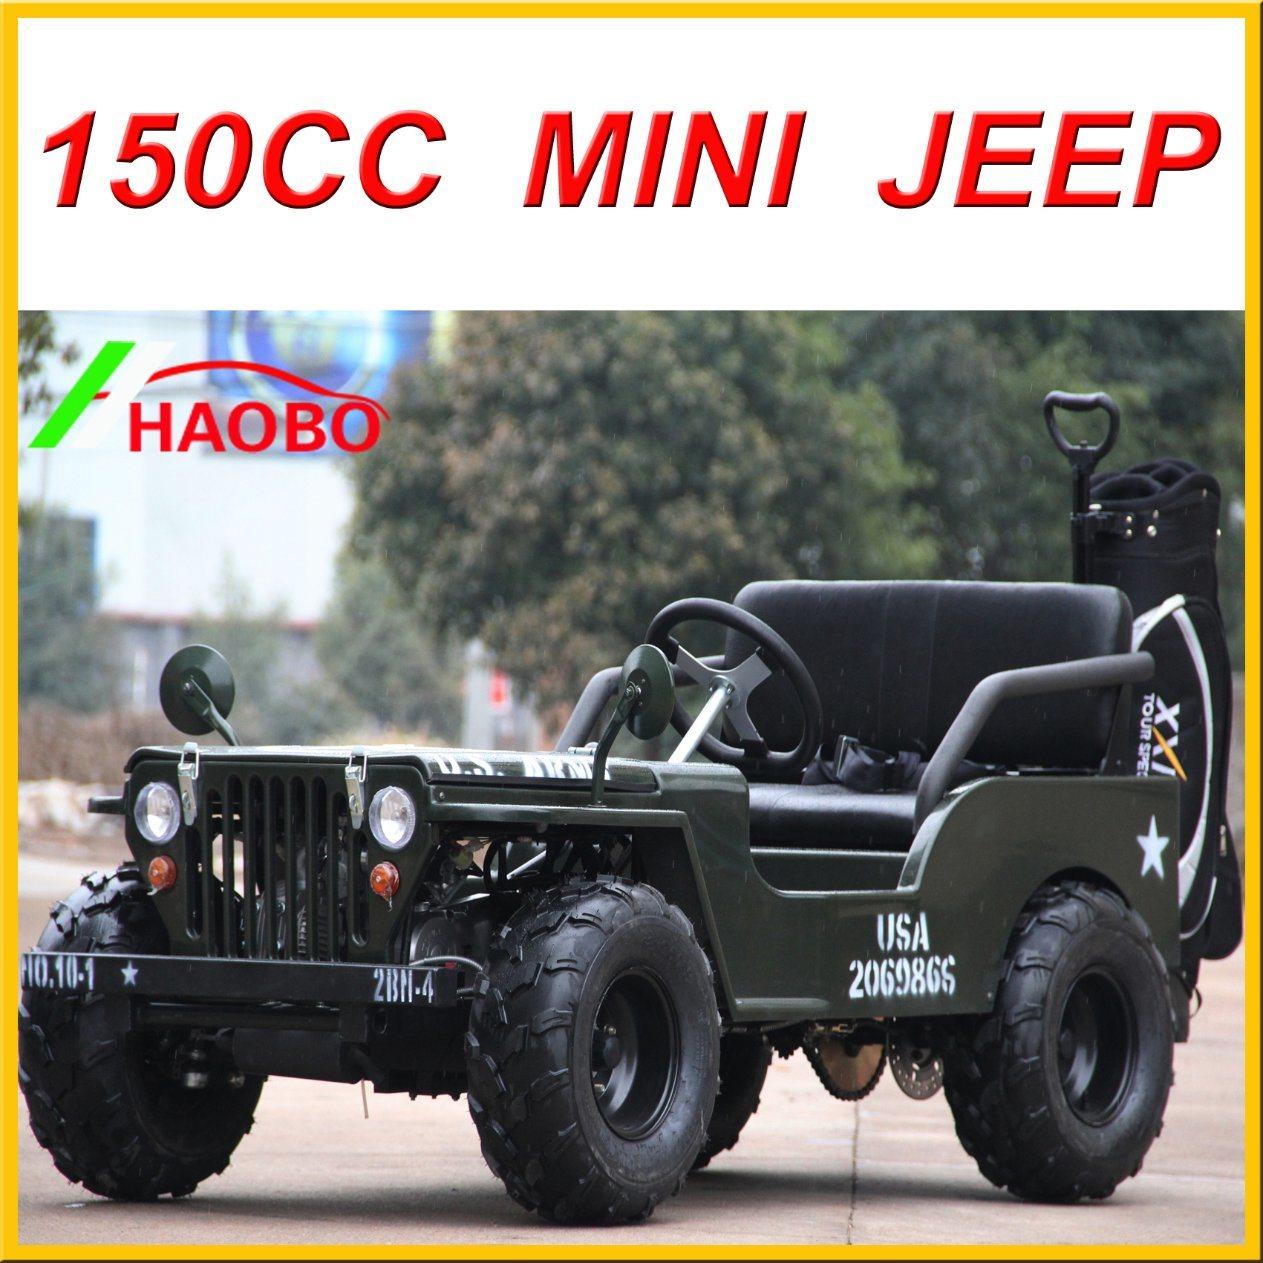 China Newest Willys Mini Jeep Lq-Jp for Sale 110cc 125cc 150cc 200cc Options